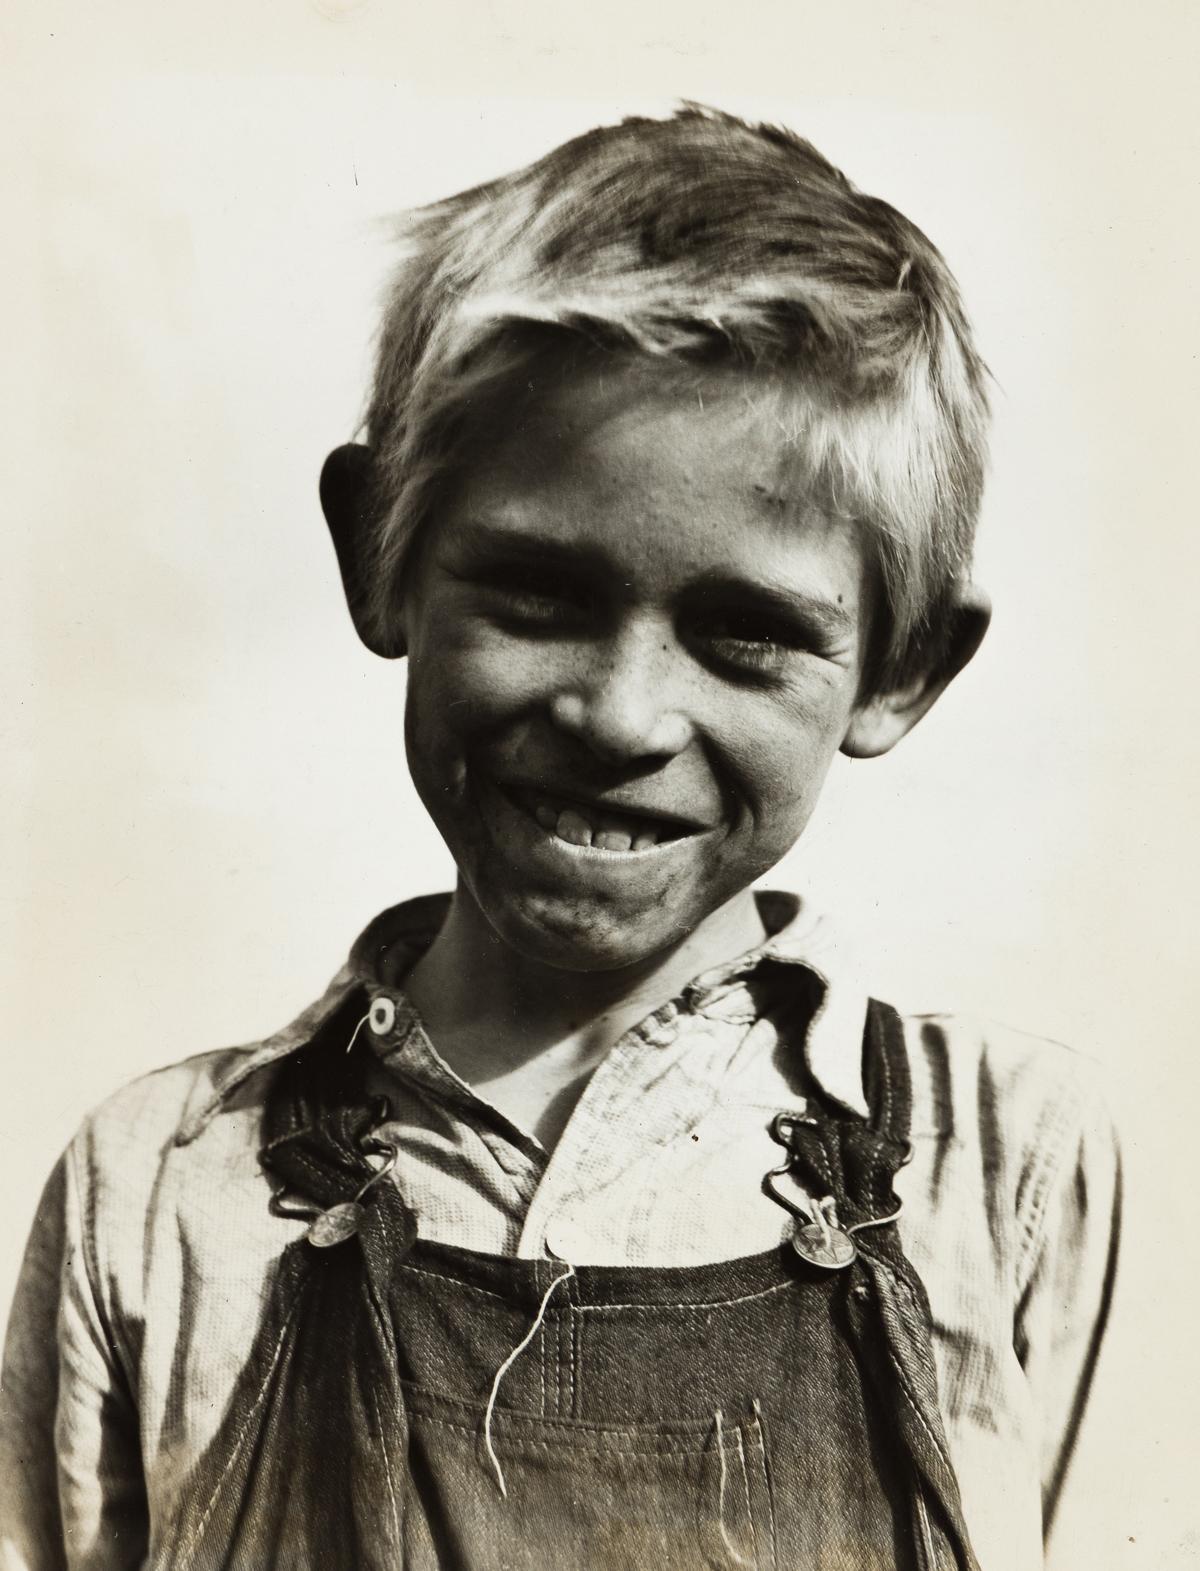 DOROTHEA LANGE (1895-1965) Son of a cotton picker near Farmersville, California.